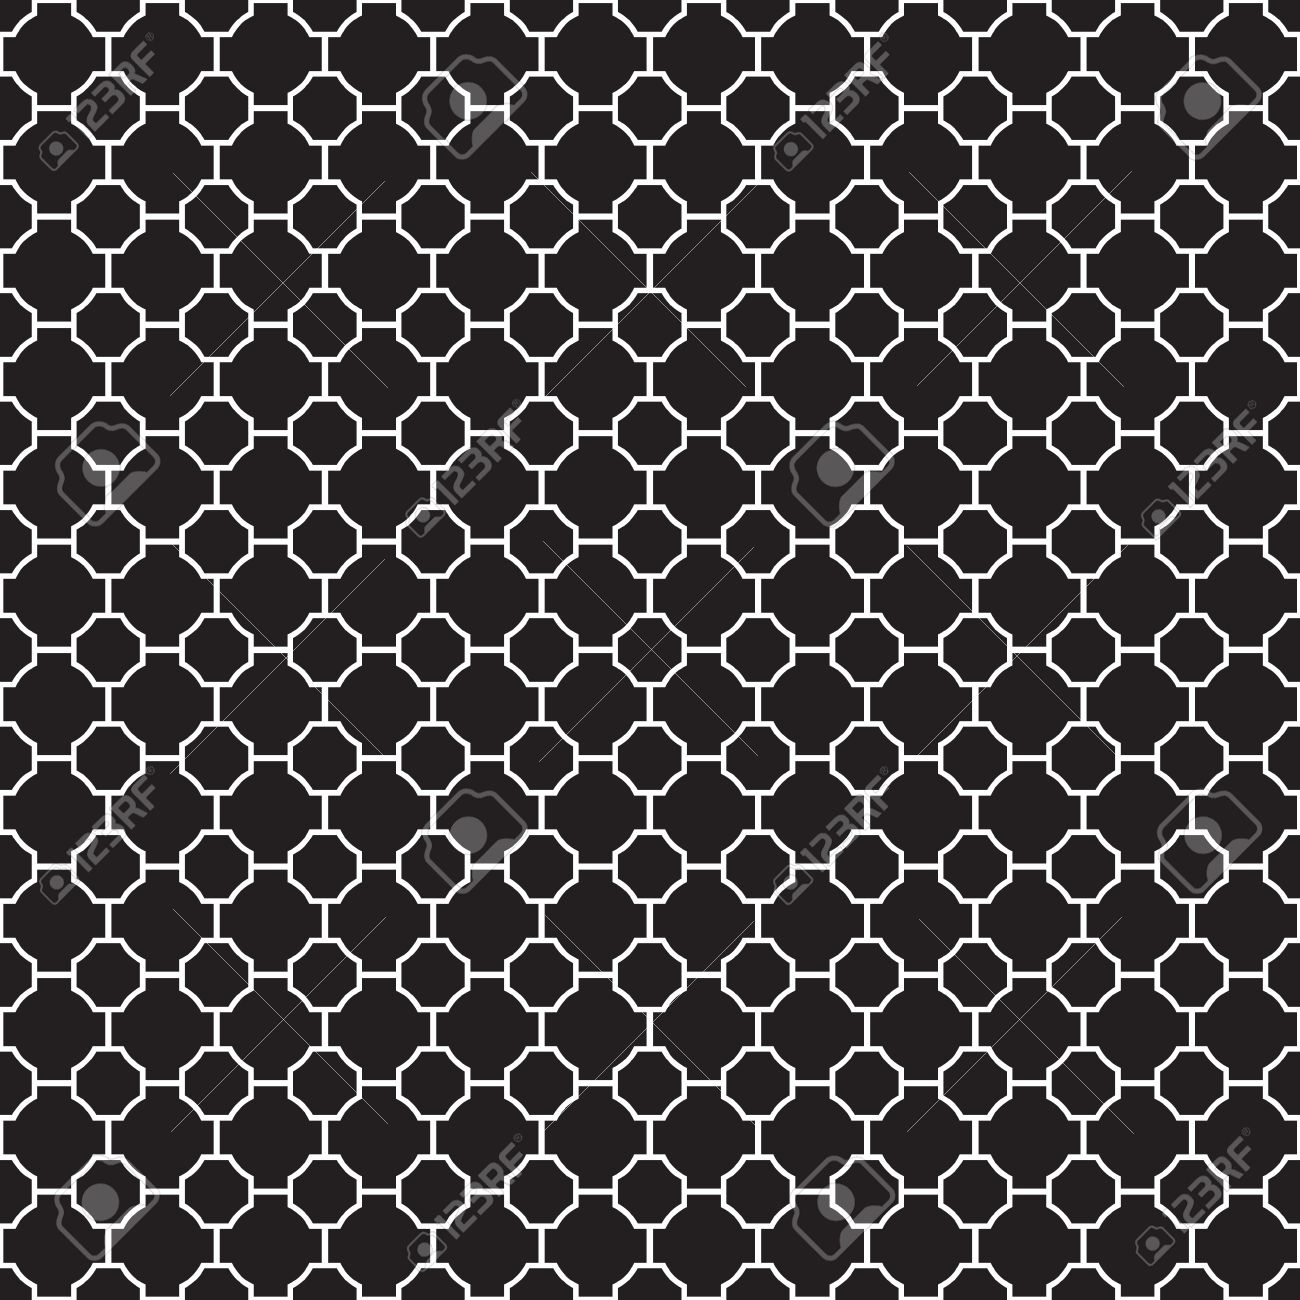 Seamless Geometric Trellis Pattern Texture Background Wallpaper Stock Vector